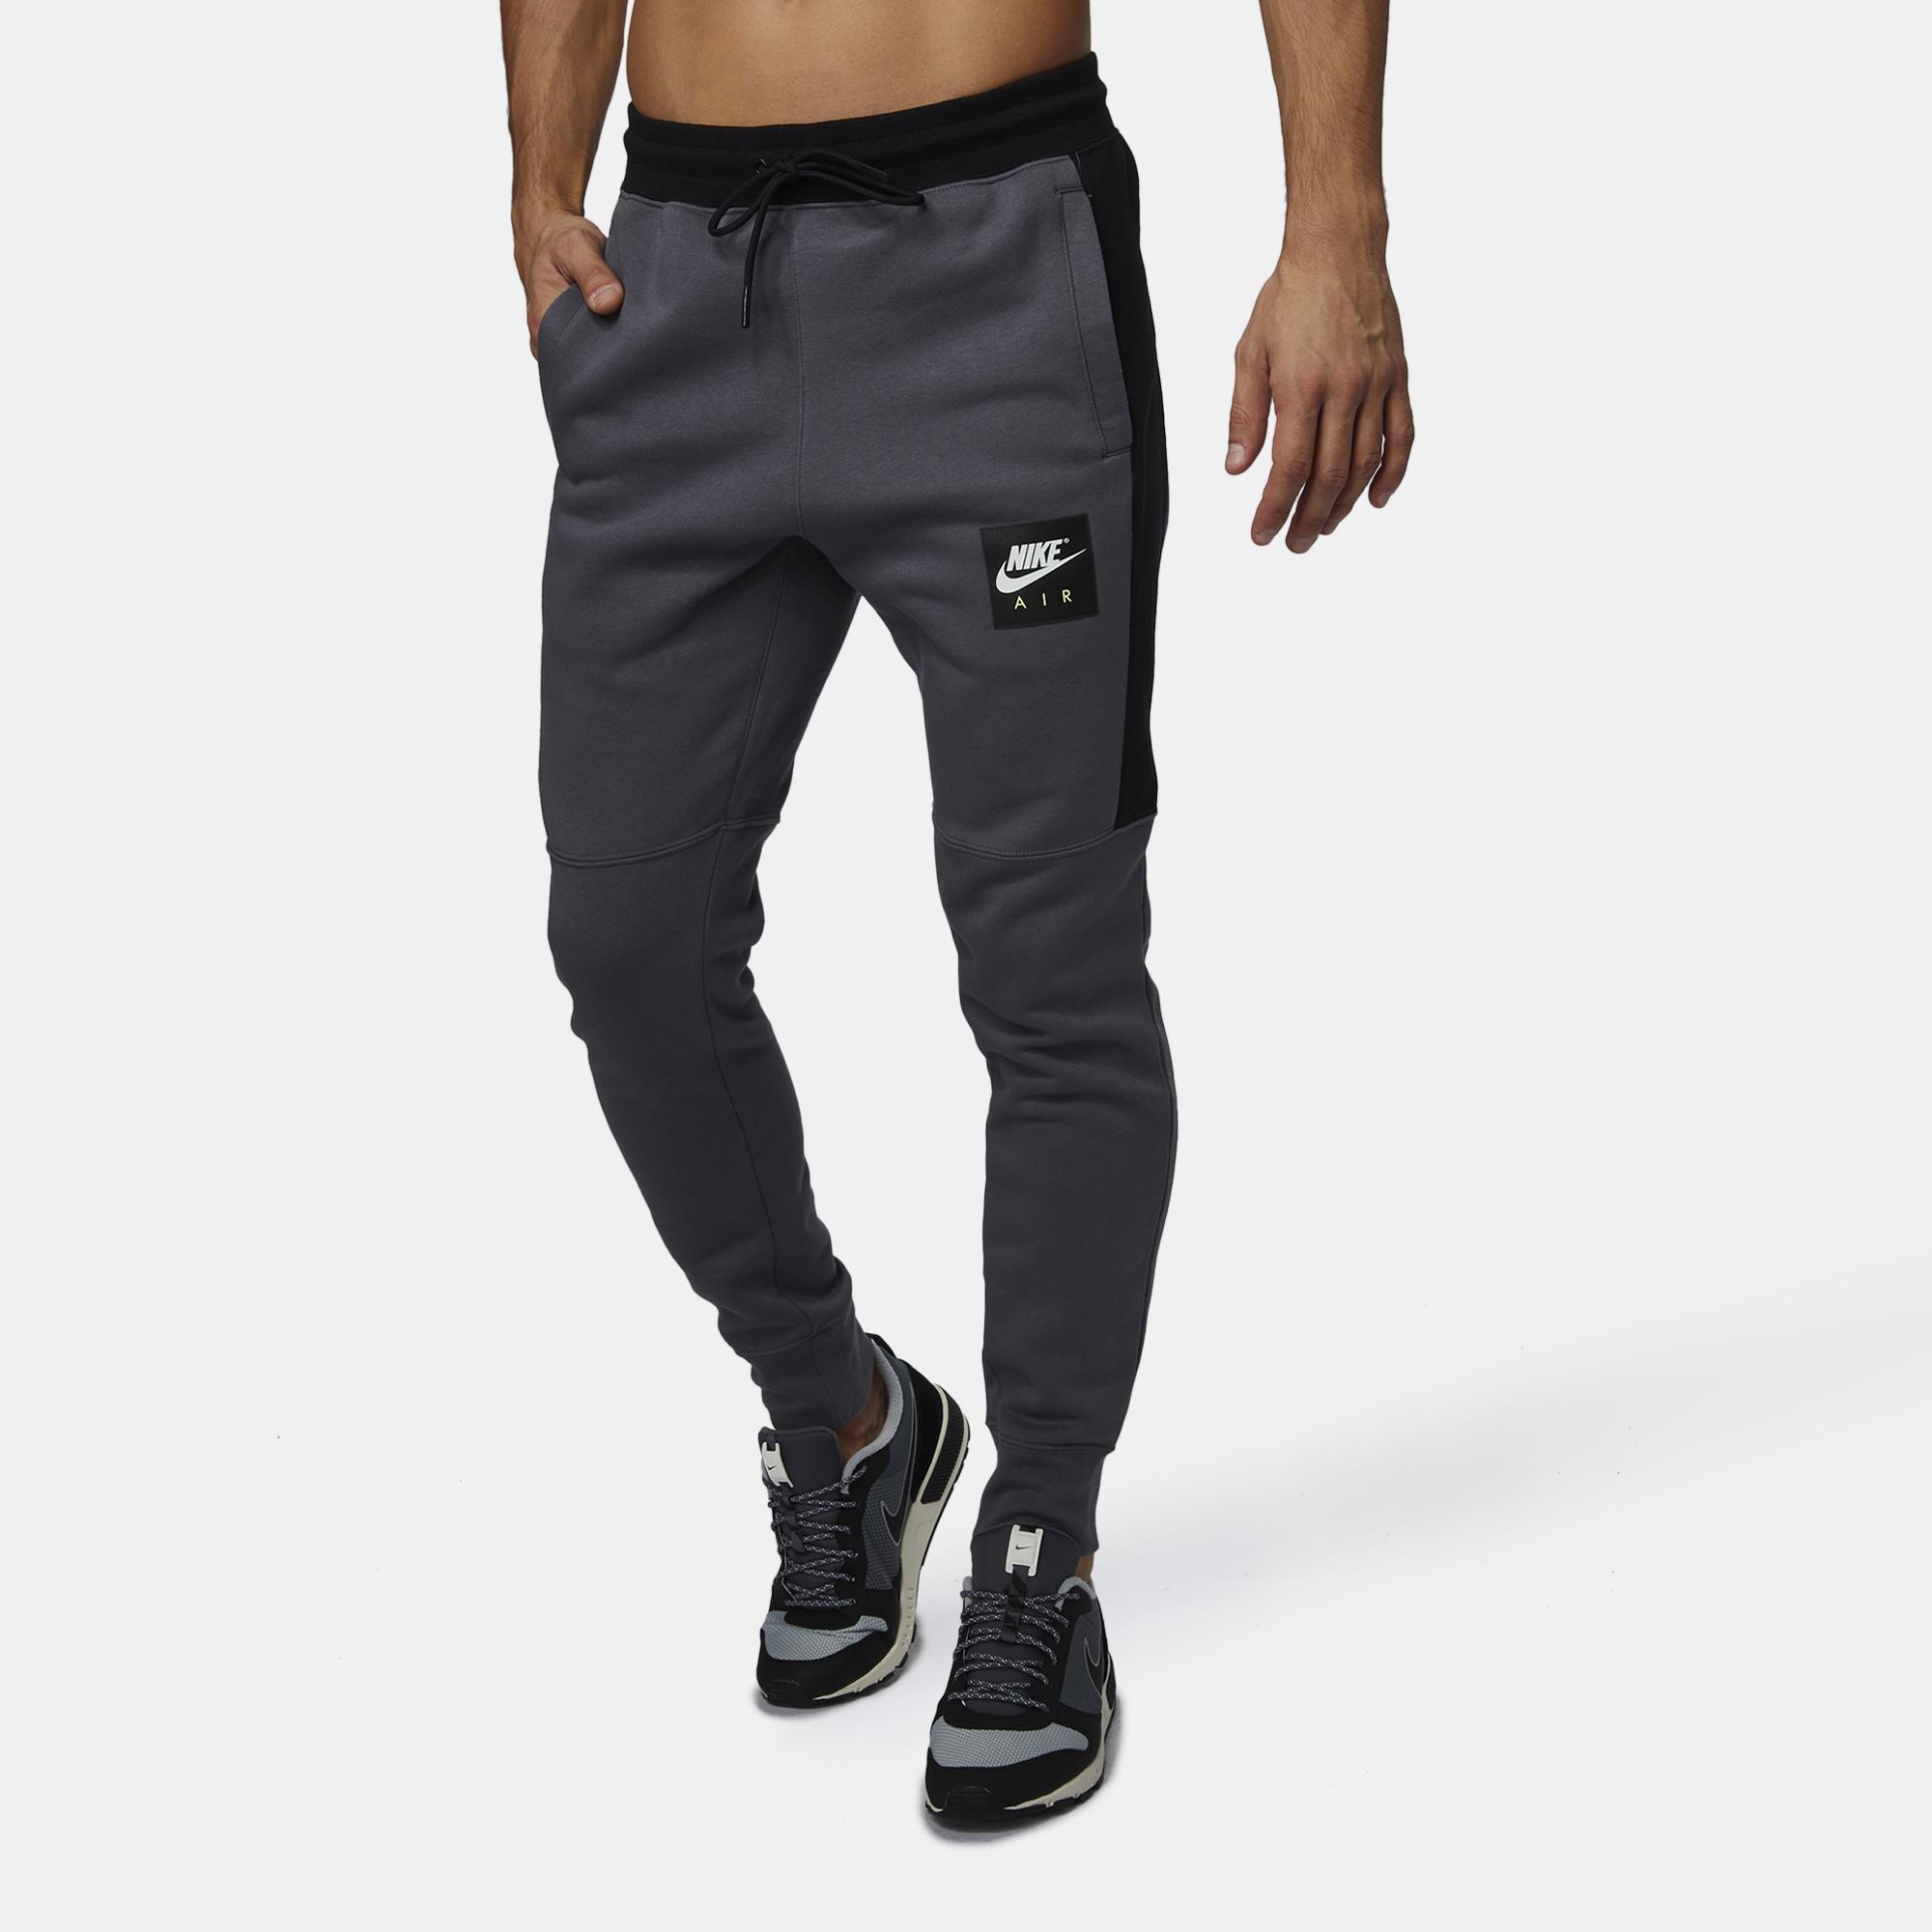 Nike Sportswear Air Fleece Jogger Pants Nkap886048 021 in